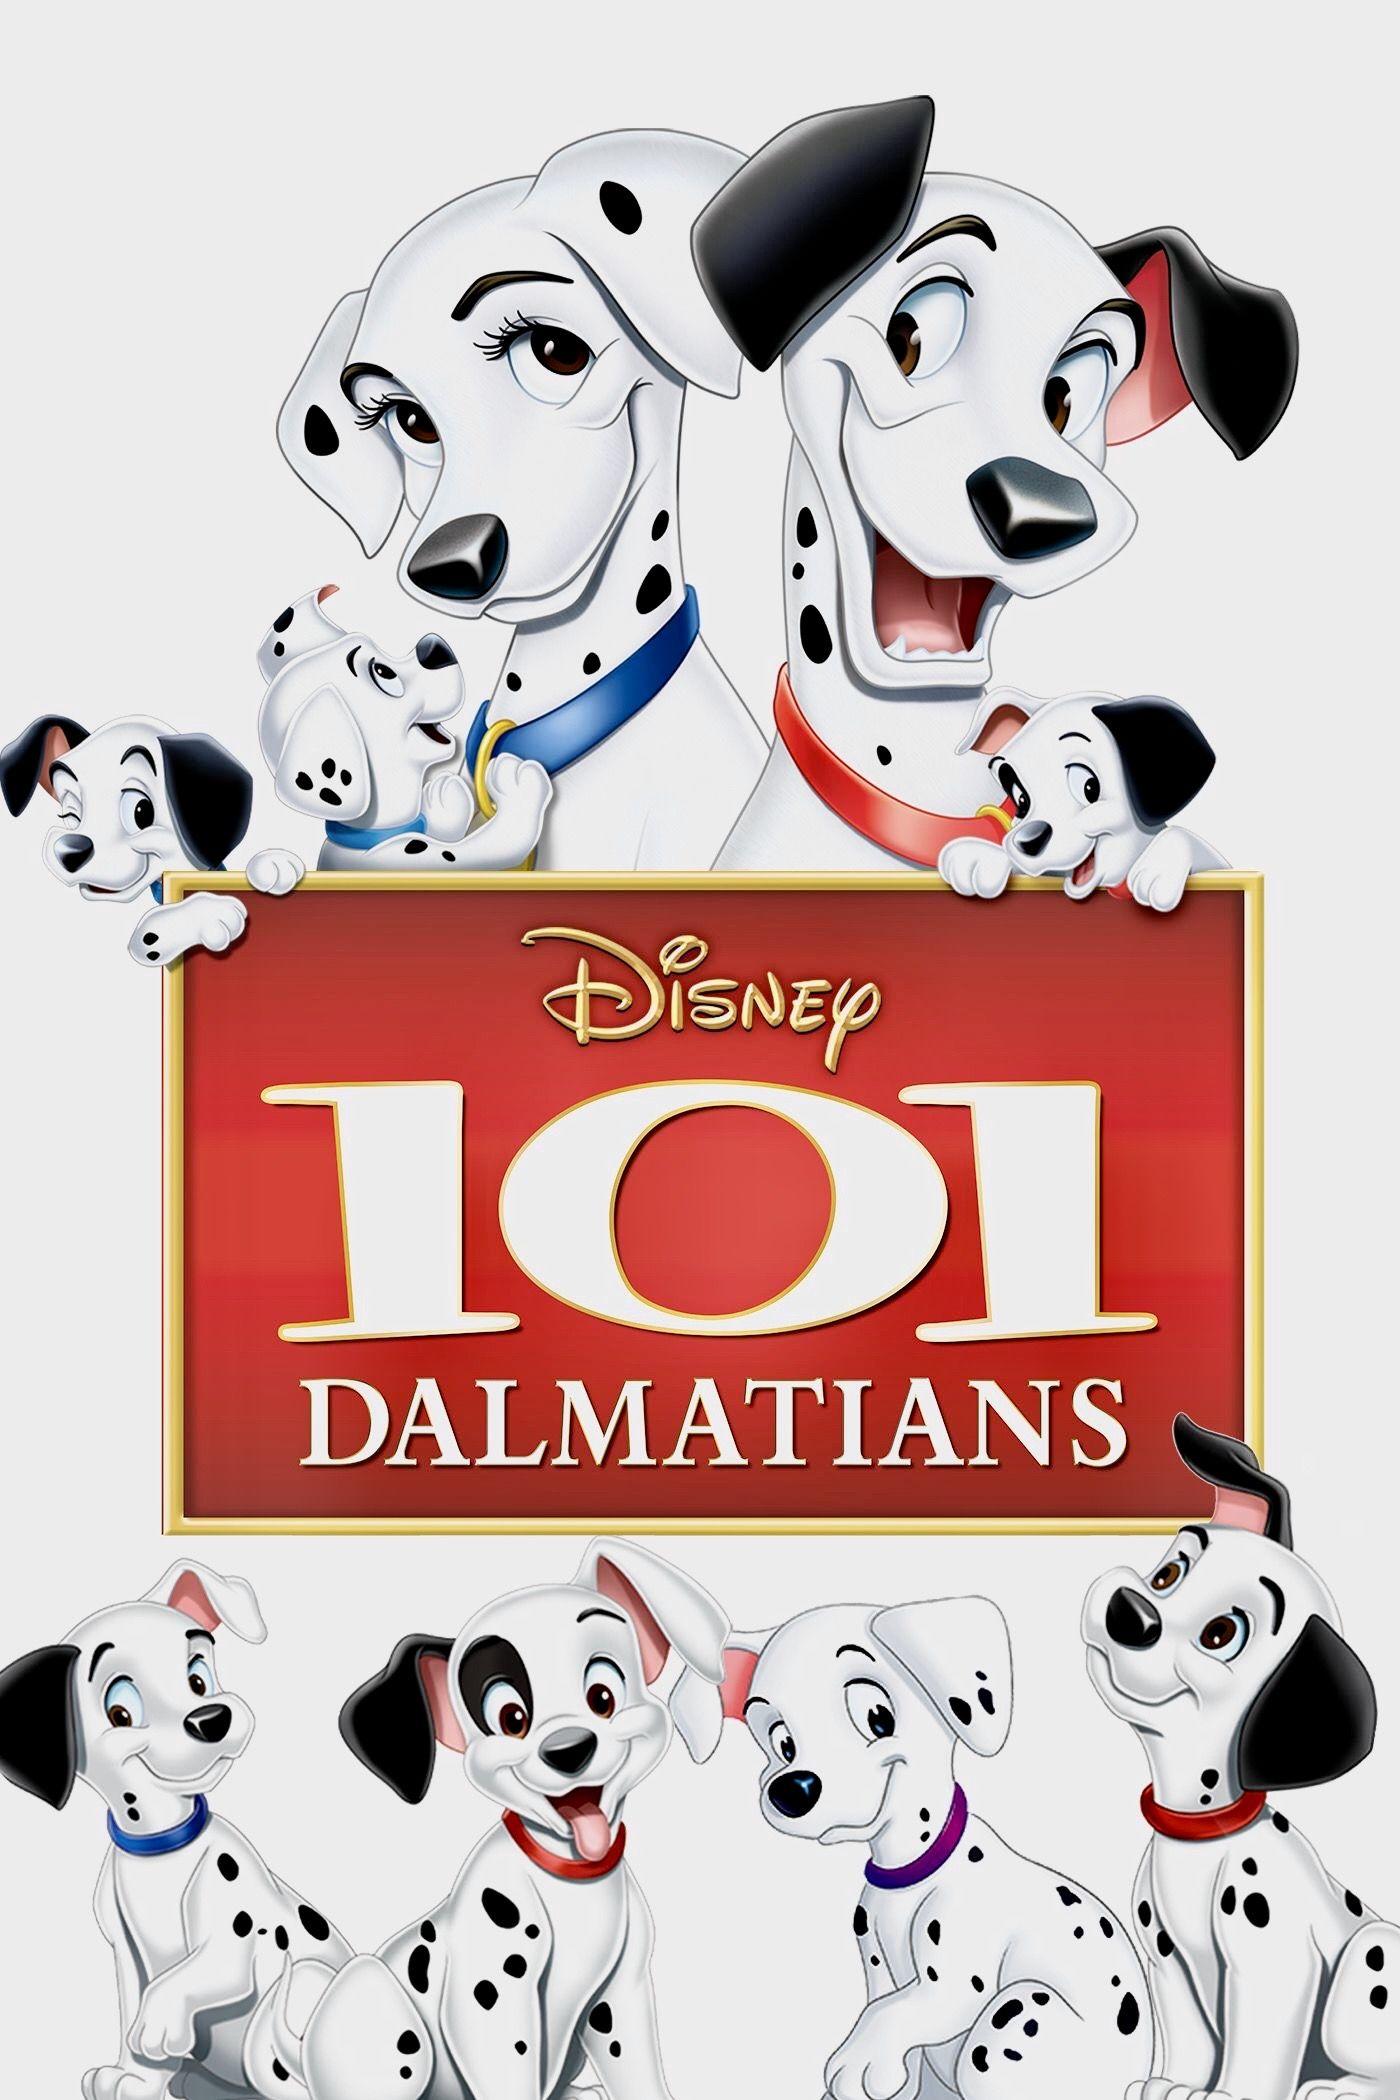 Pin De Bruna Cipriani En Juli En 2020 101 Dalmatas Personajes Dalmata Personajes Animados De Disney